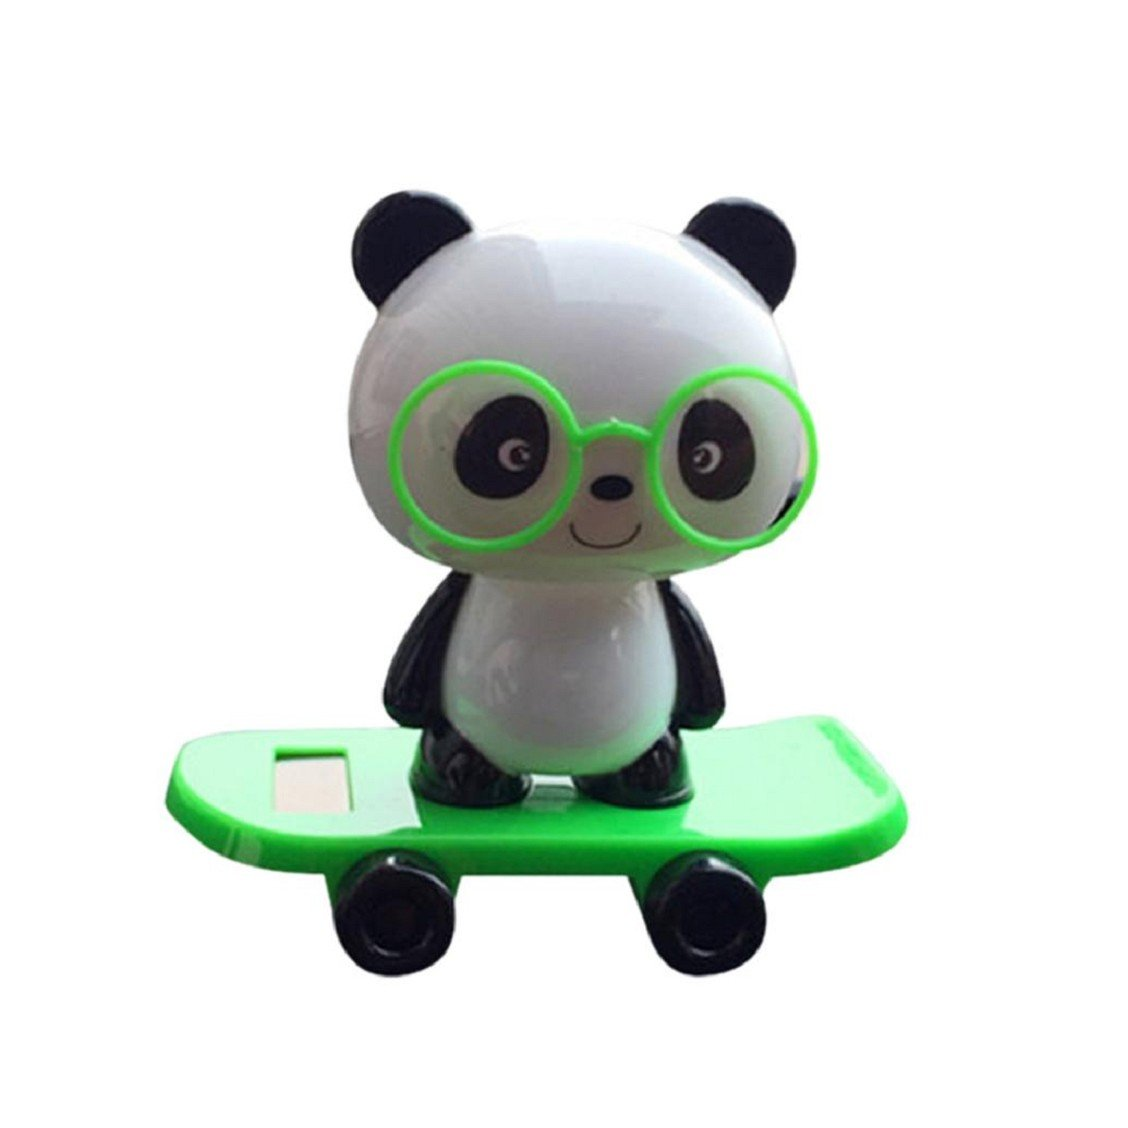 Car Powered Dancing Animal Swinging Animated Bobble Dancer Decor Naladoo Solar Dancing Toy